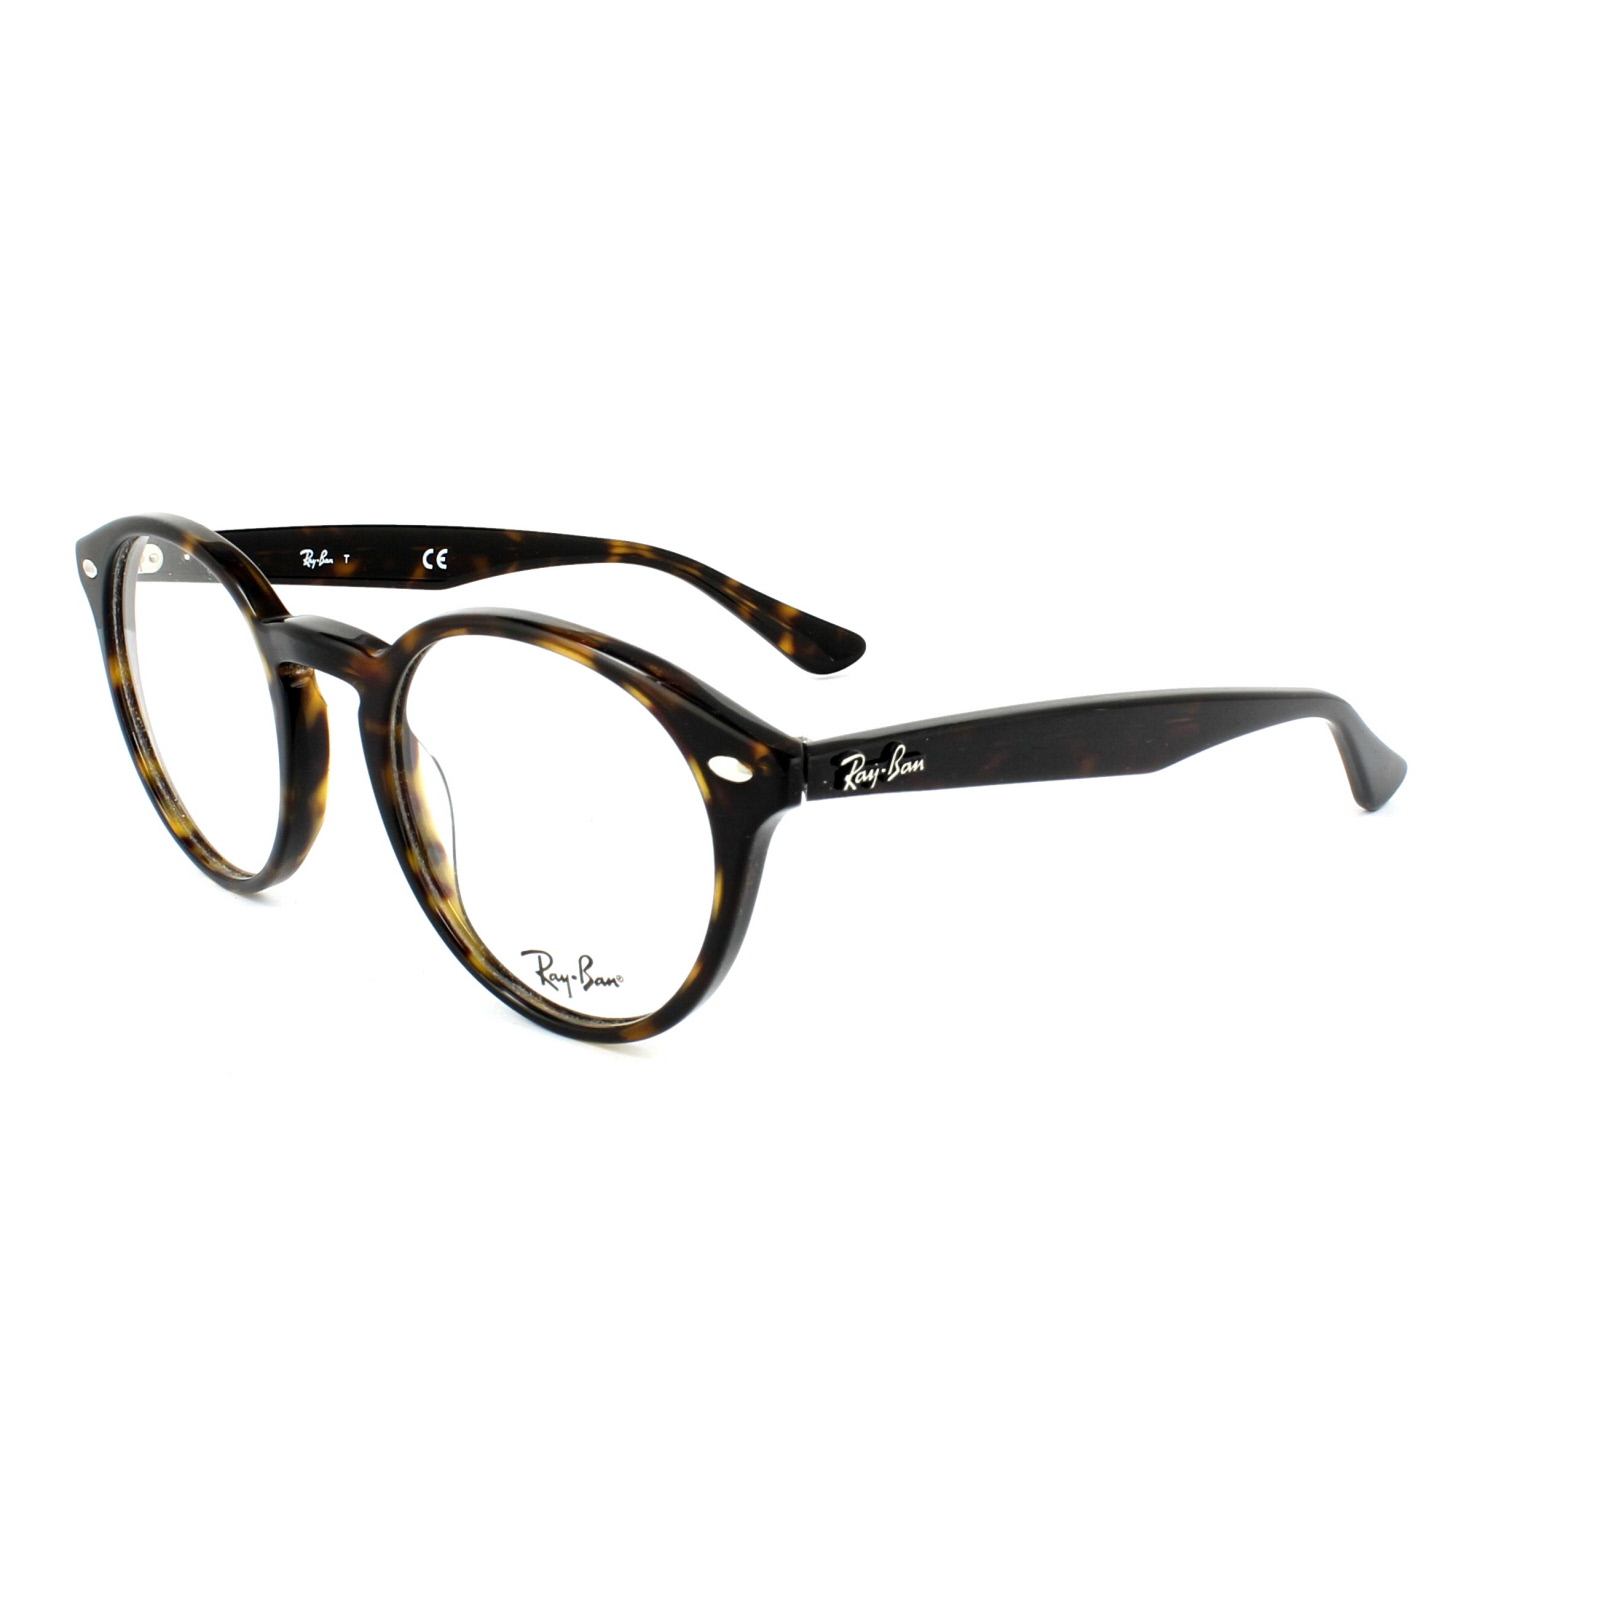 ac84a02207f Ray-Ban Glasses Frames 2180V 2012 Dark Havana 8053672356878